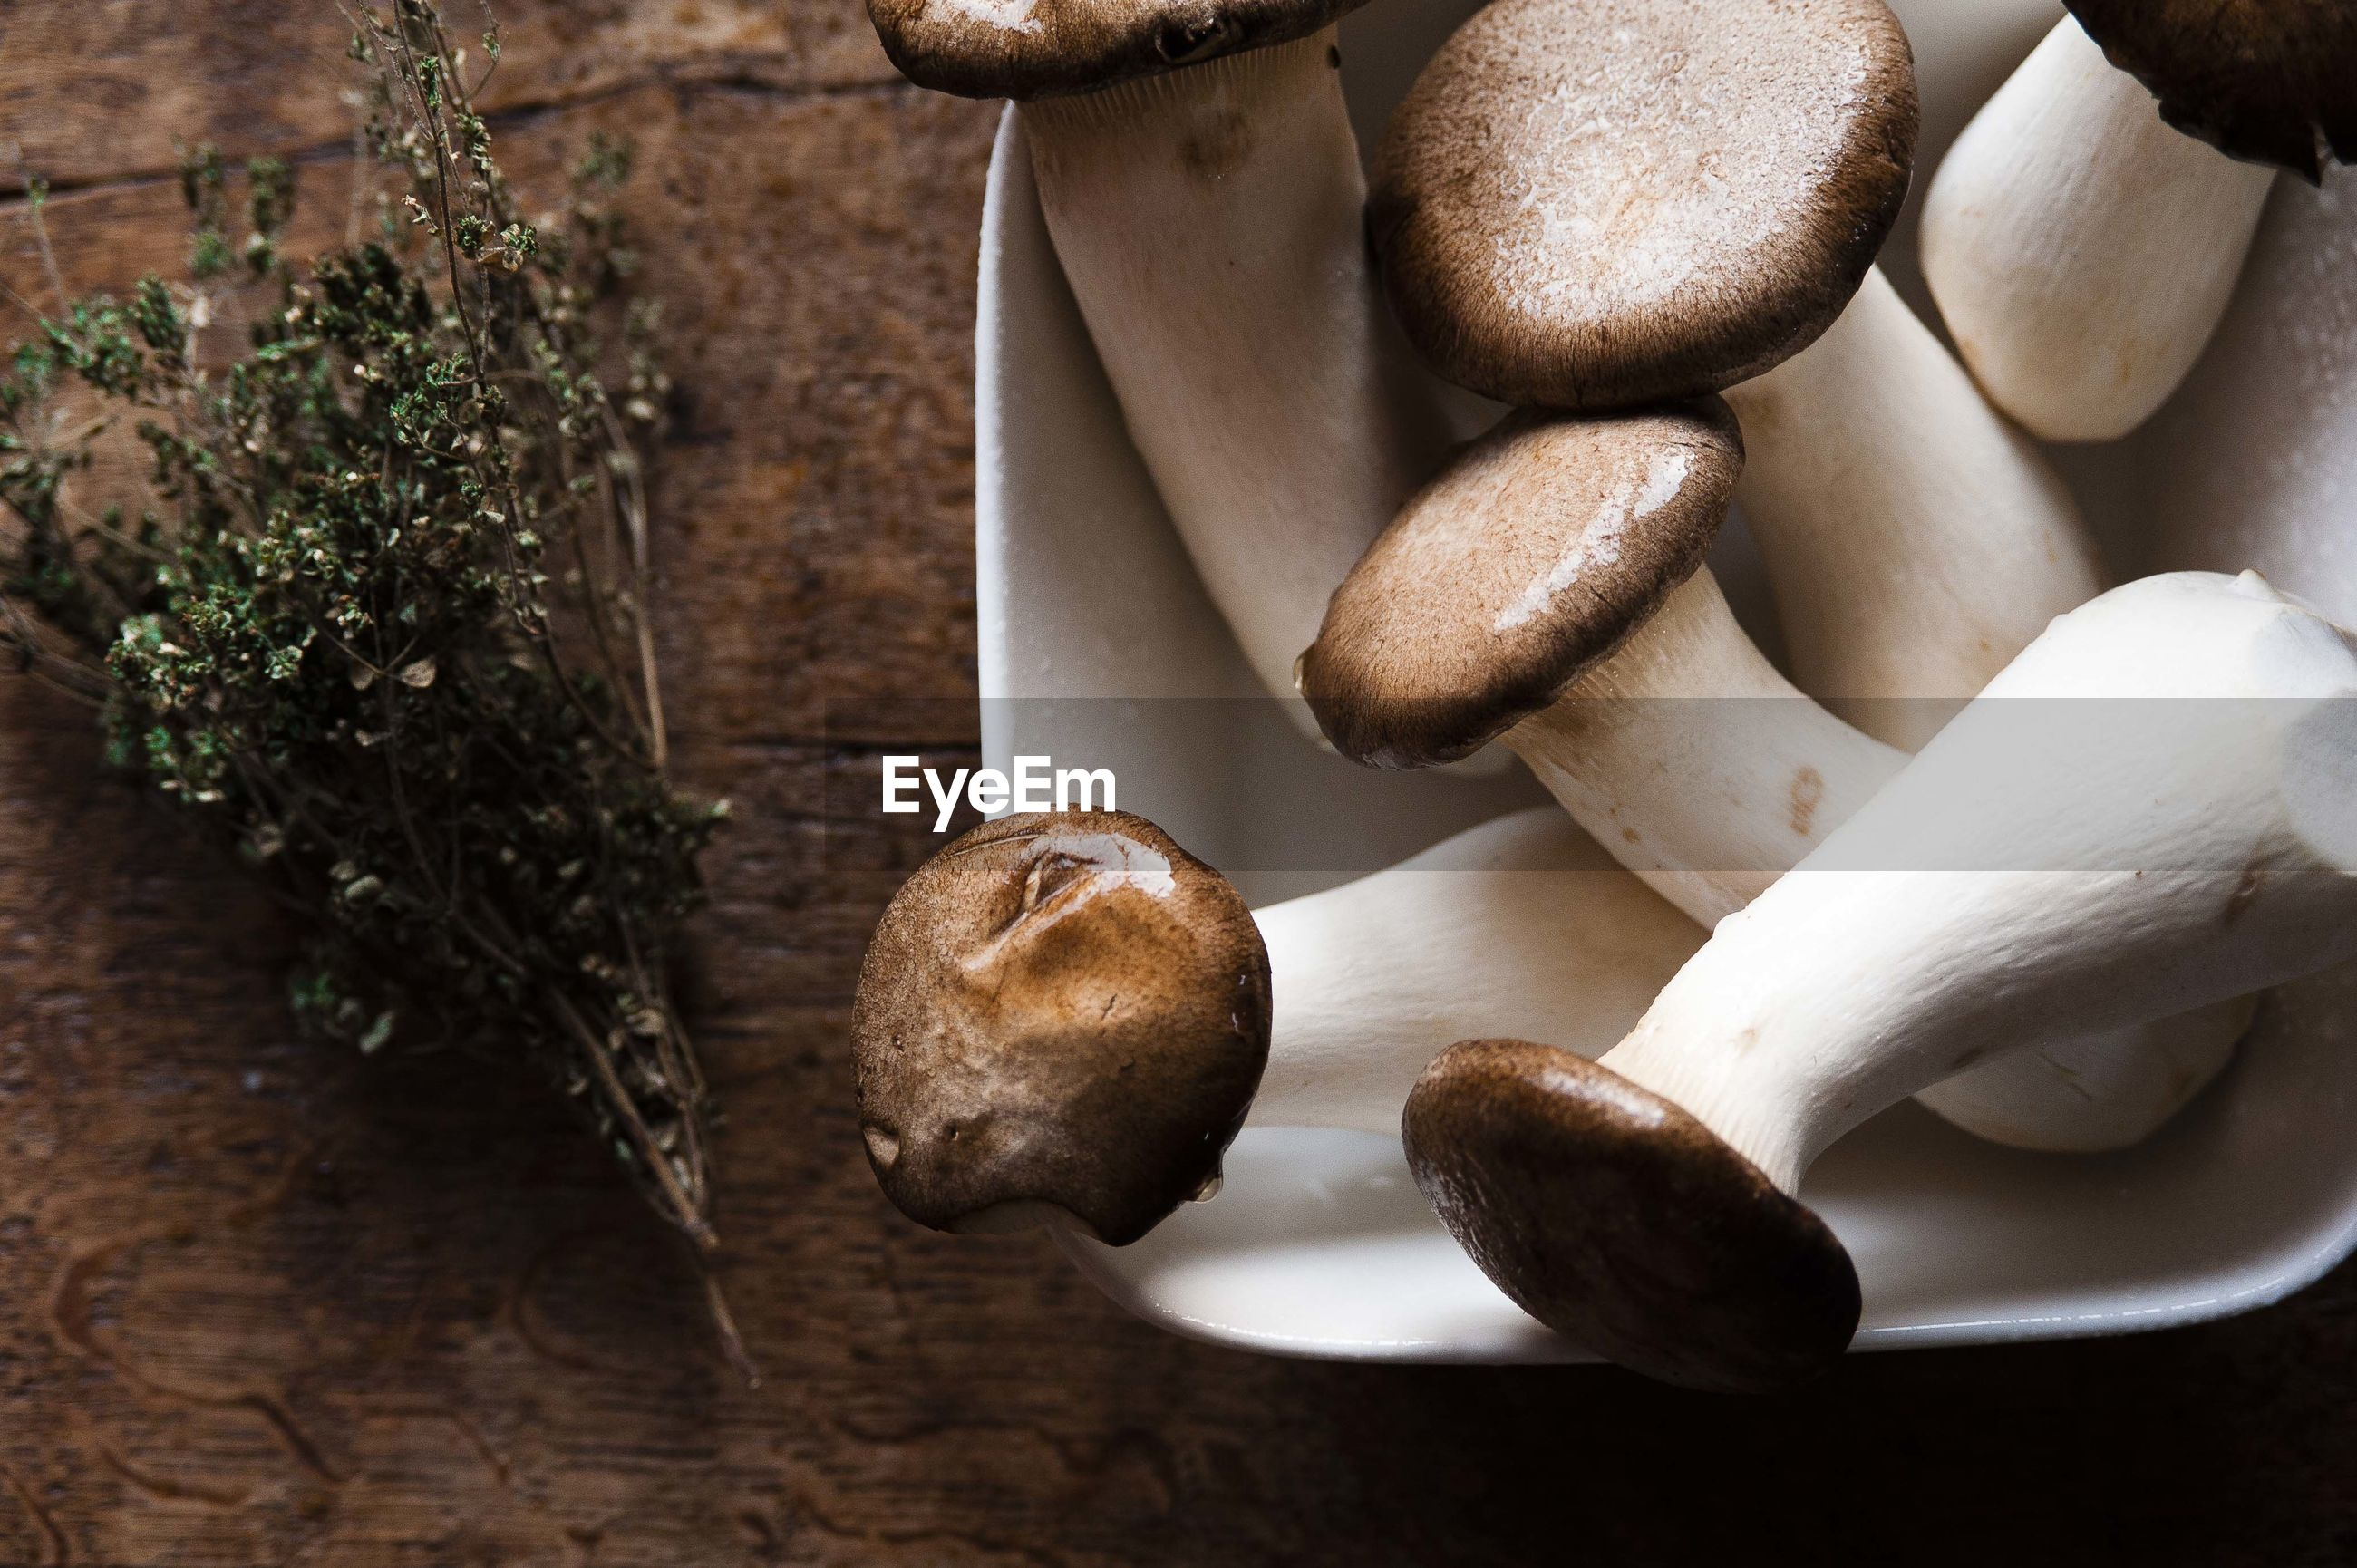 Close-up of boletus mushrooms in bowl